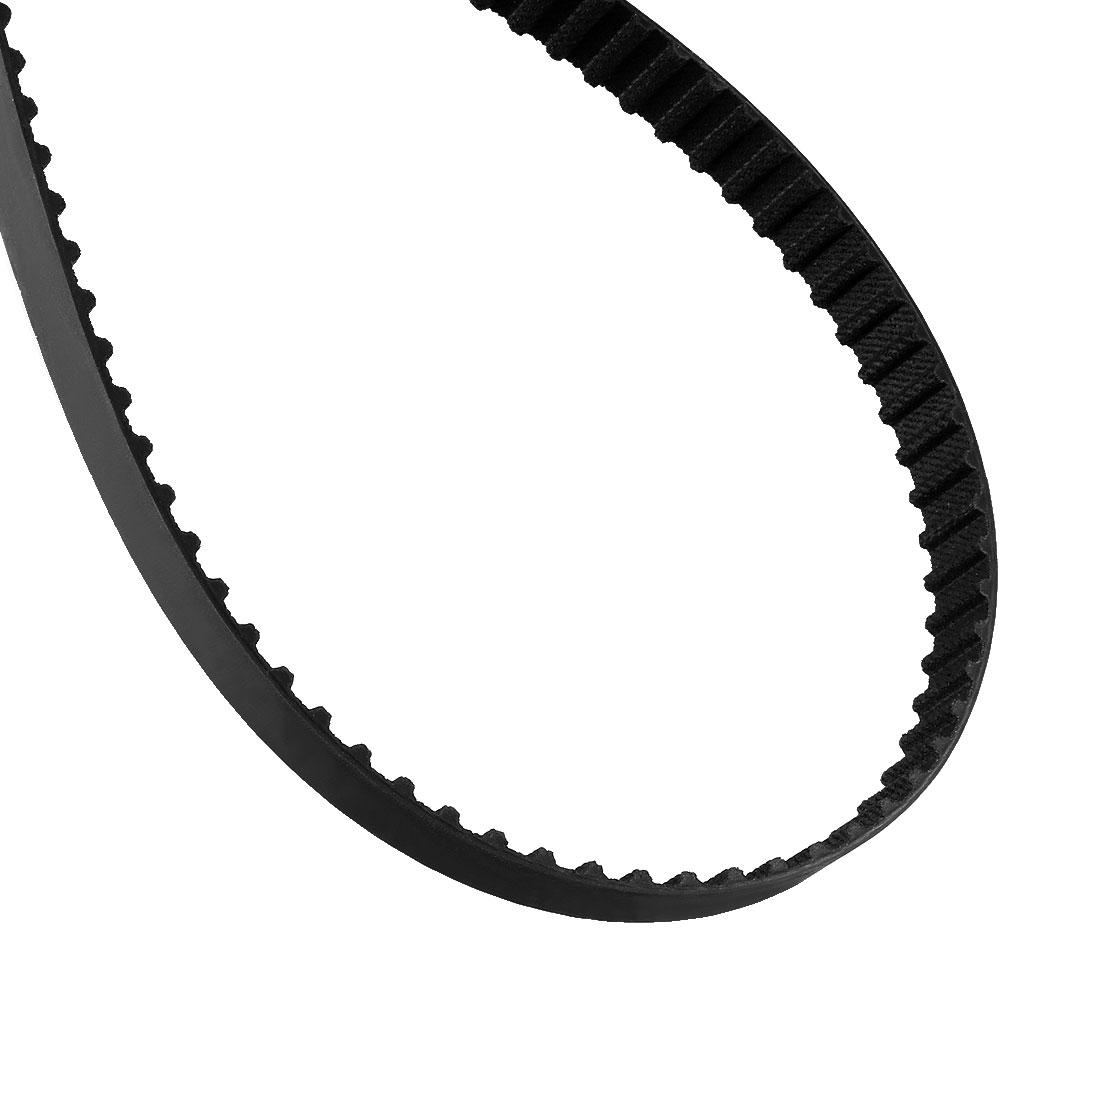 384XL 192 Teeth 10mm Width 5.08mm Pitch Stepper Motor Rubber Timing Geared Belt